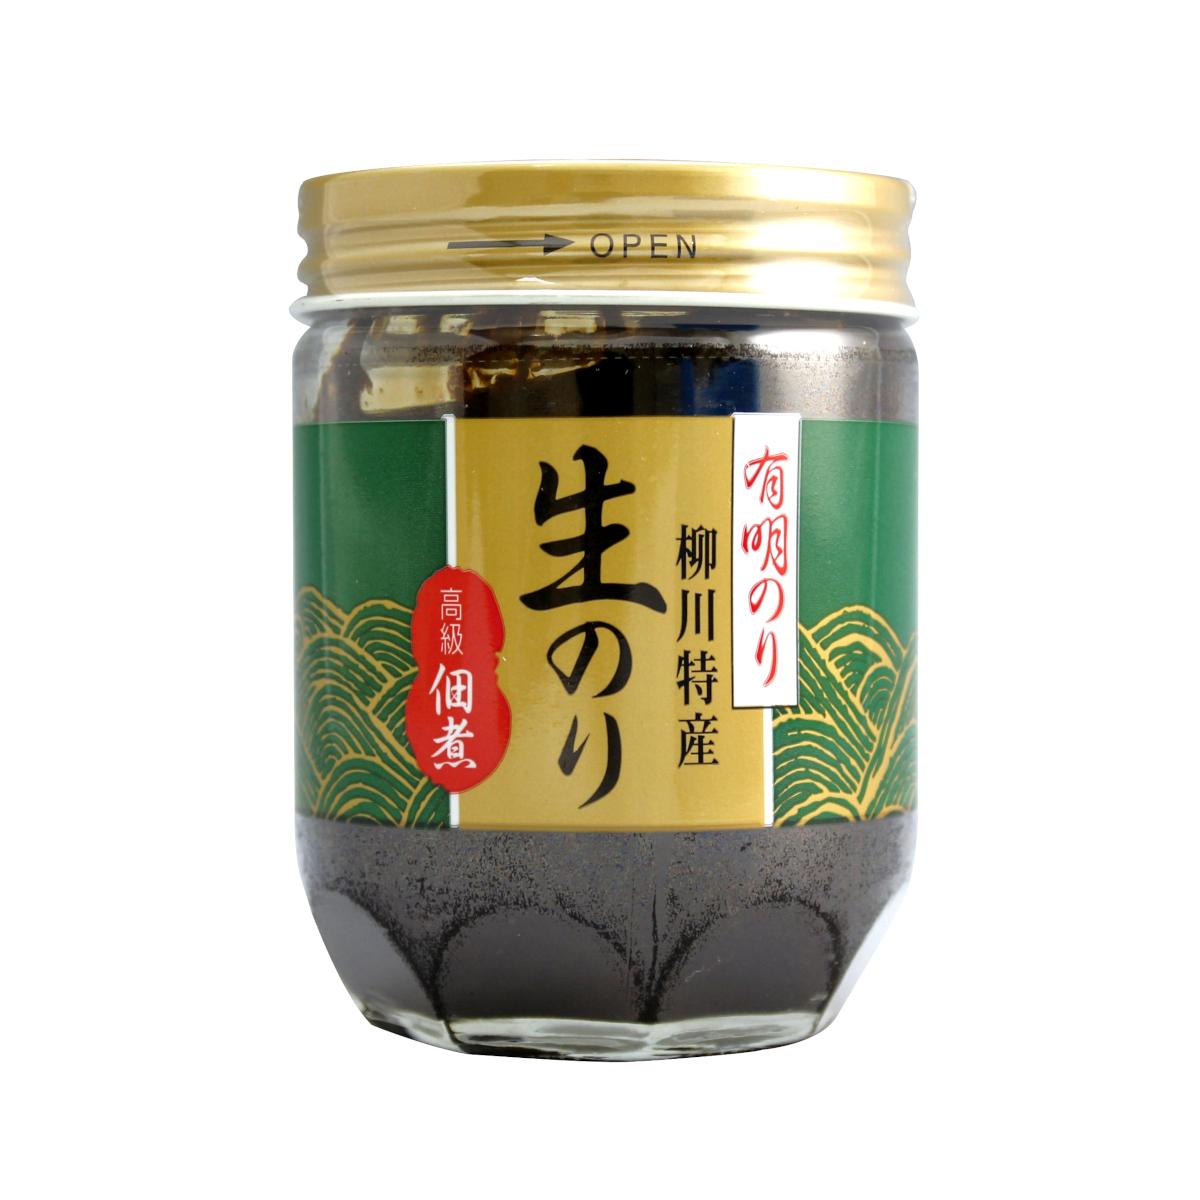 【Z-361】有明産生のり佃煮 170g